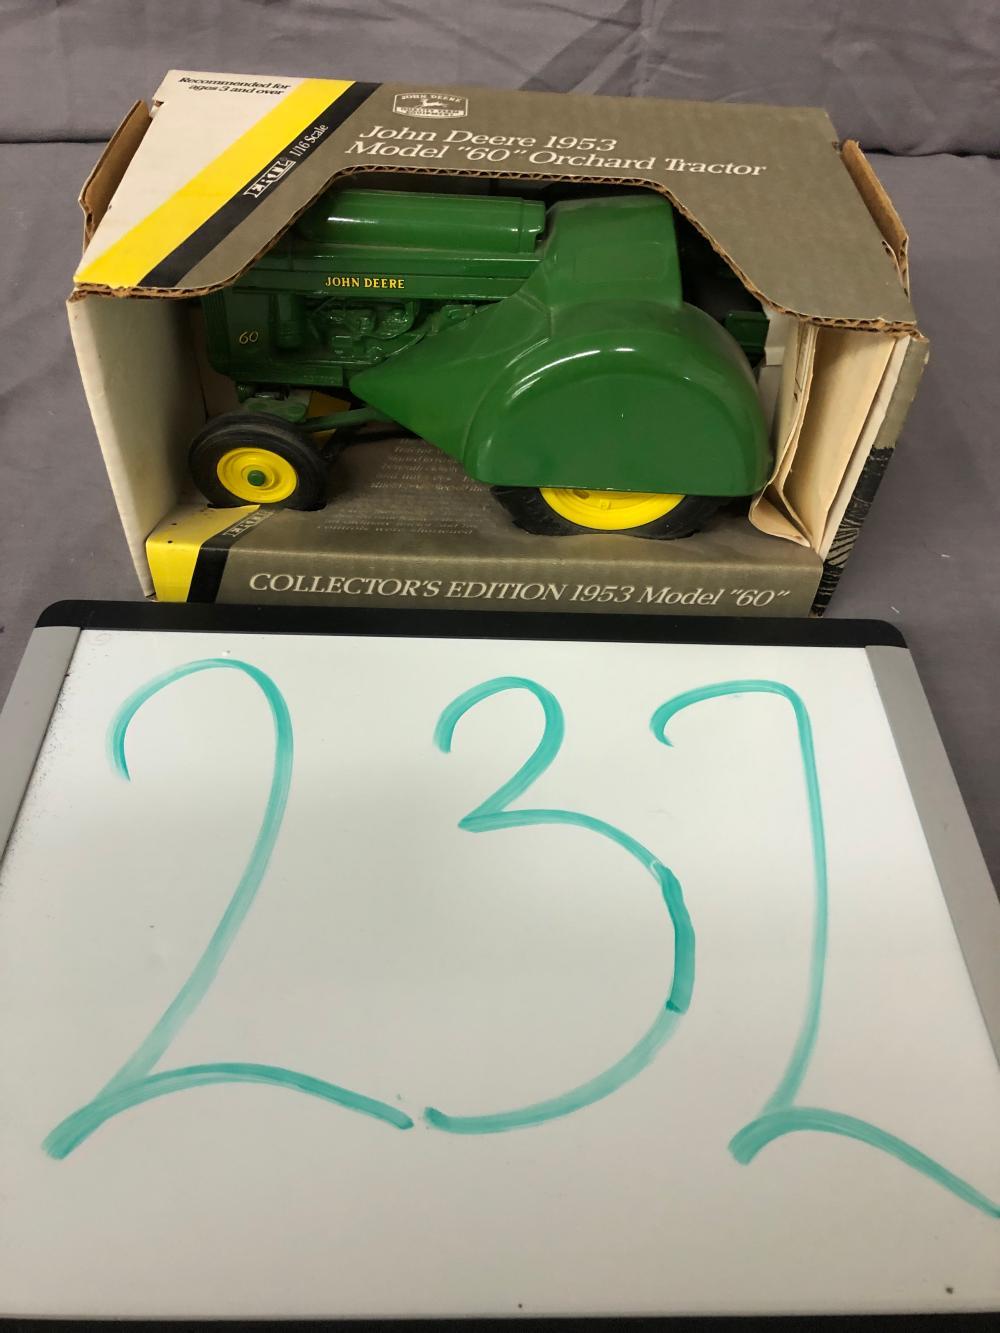 Lot 232: 1/16th Scale John Deere 60 Orchard